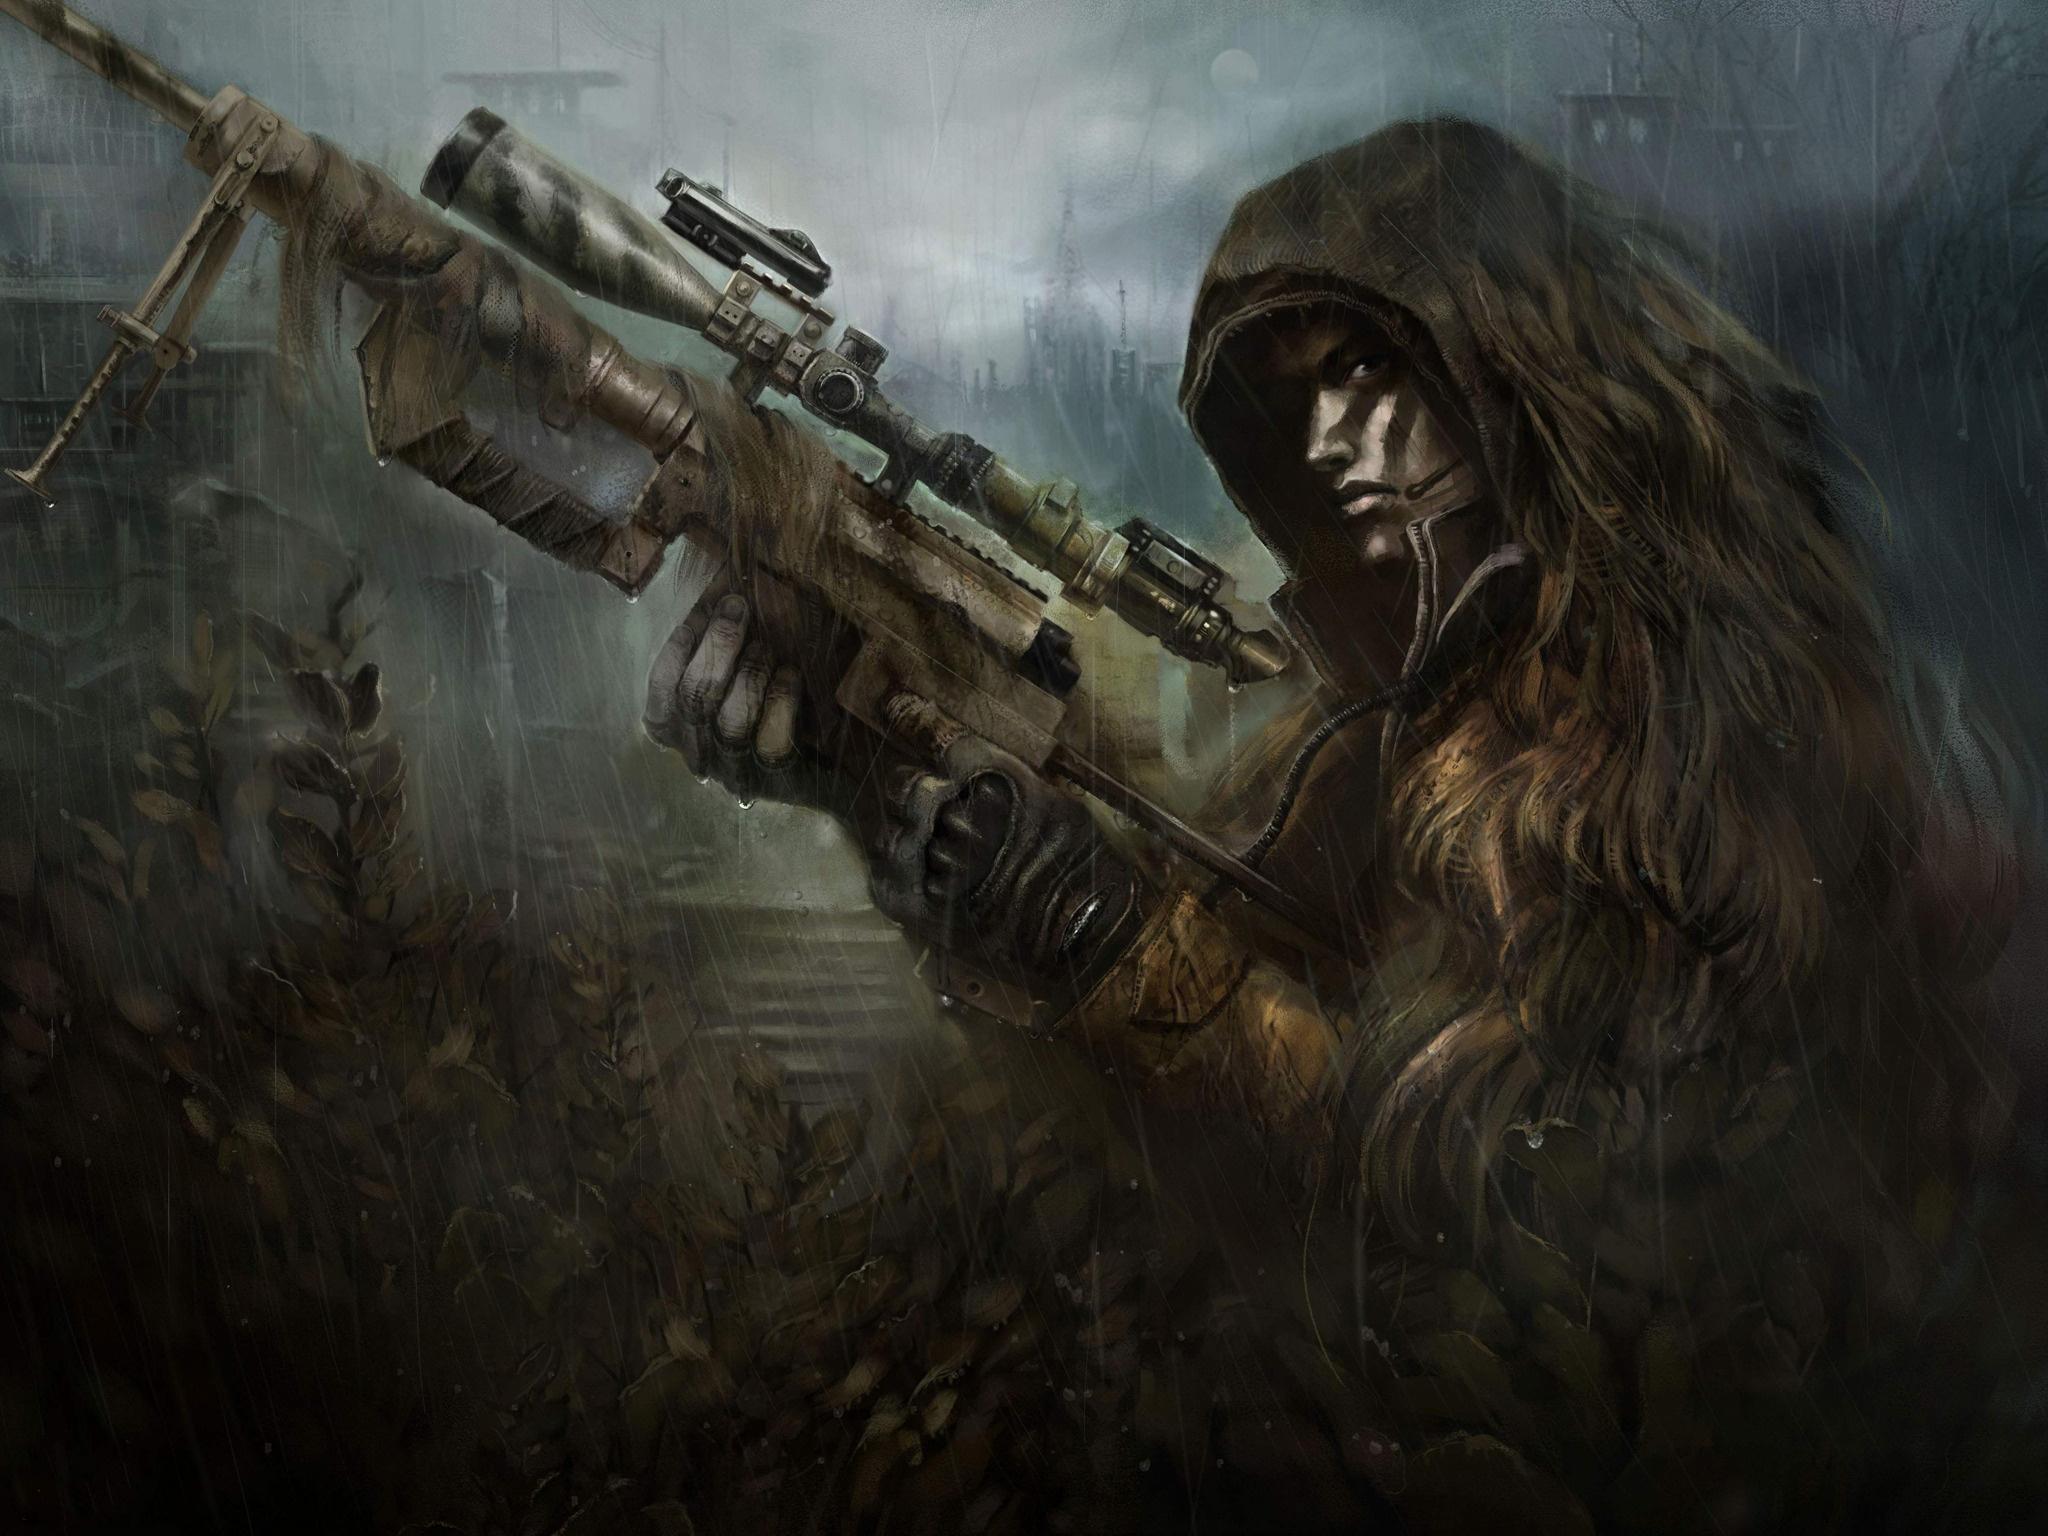 Wallpaper soldier sniper rain camouflage rifle BlackShot desktop 2048x1536